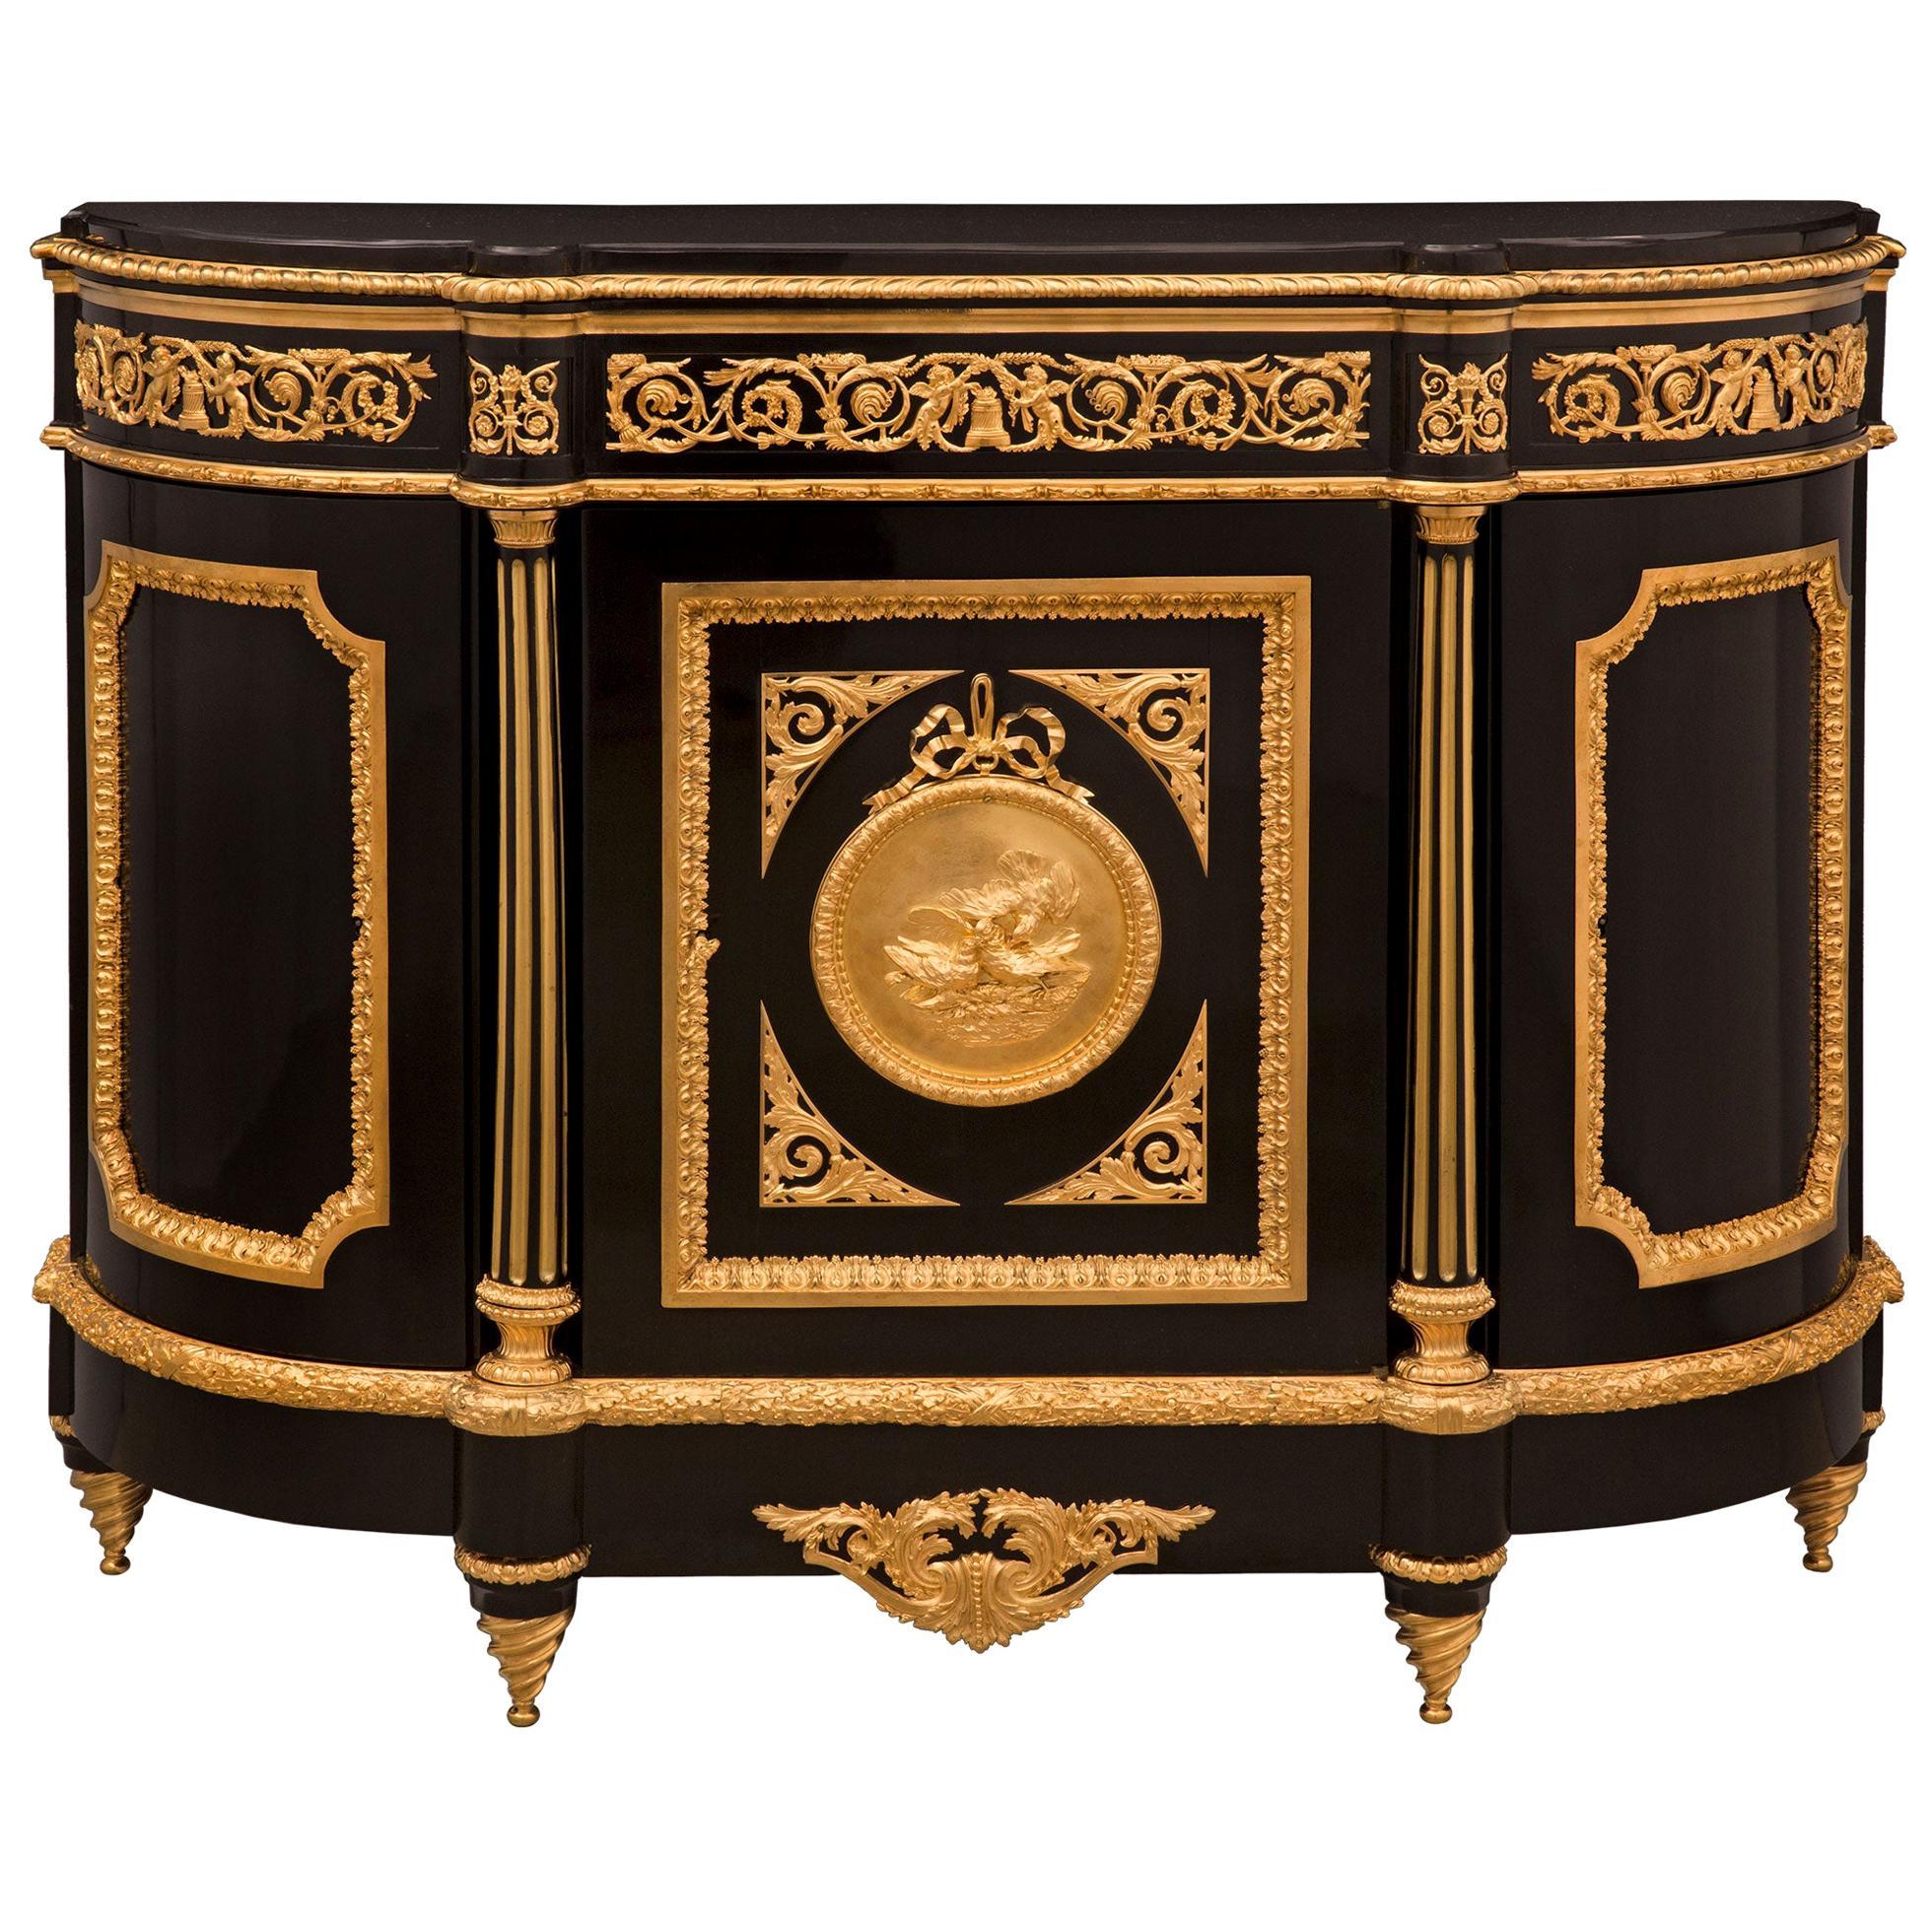 French 19th Century Louis XVI St. Belle Époque Period Buffet